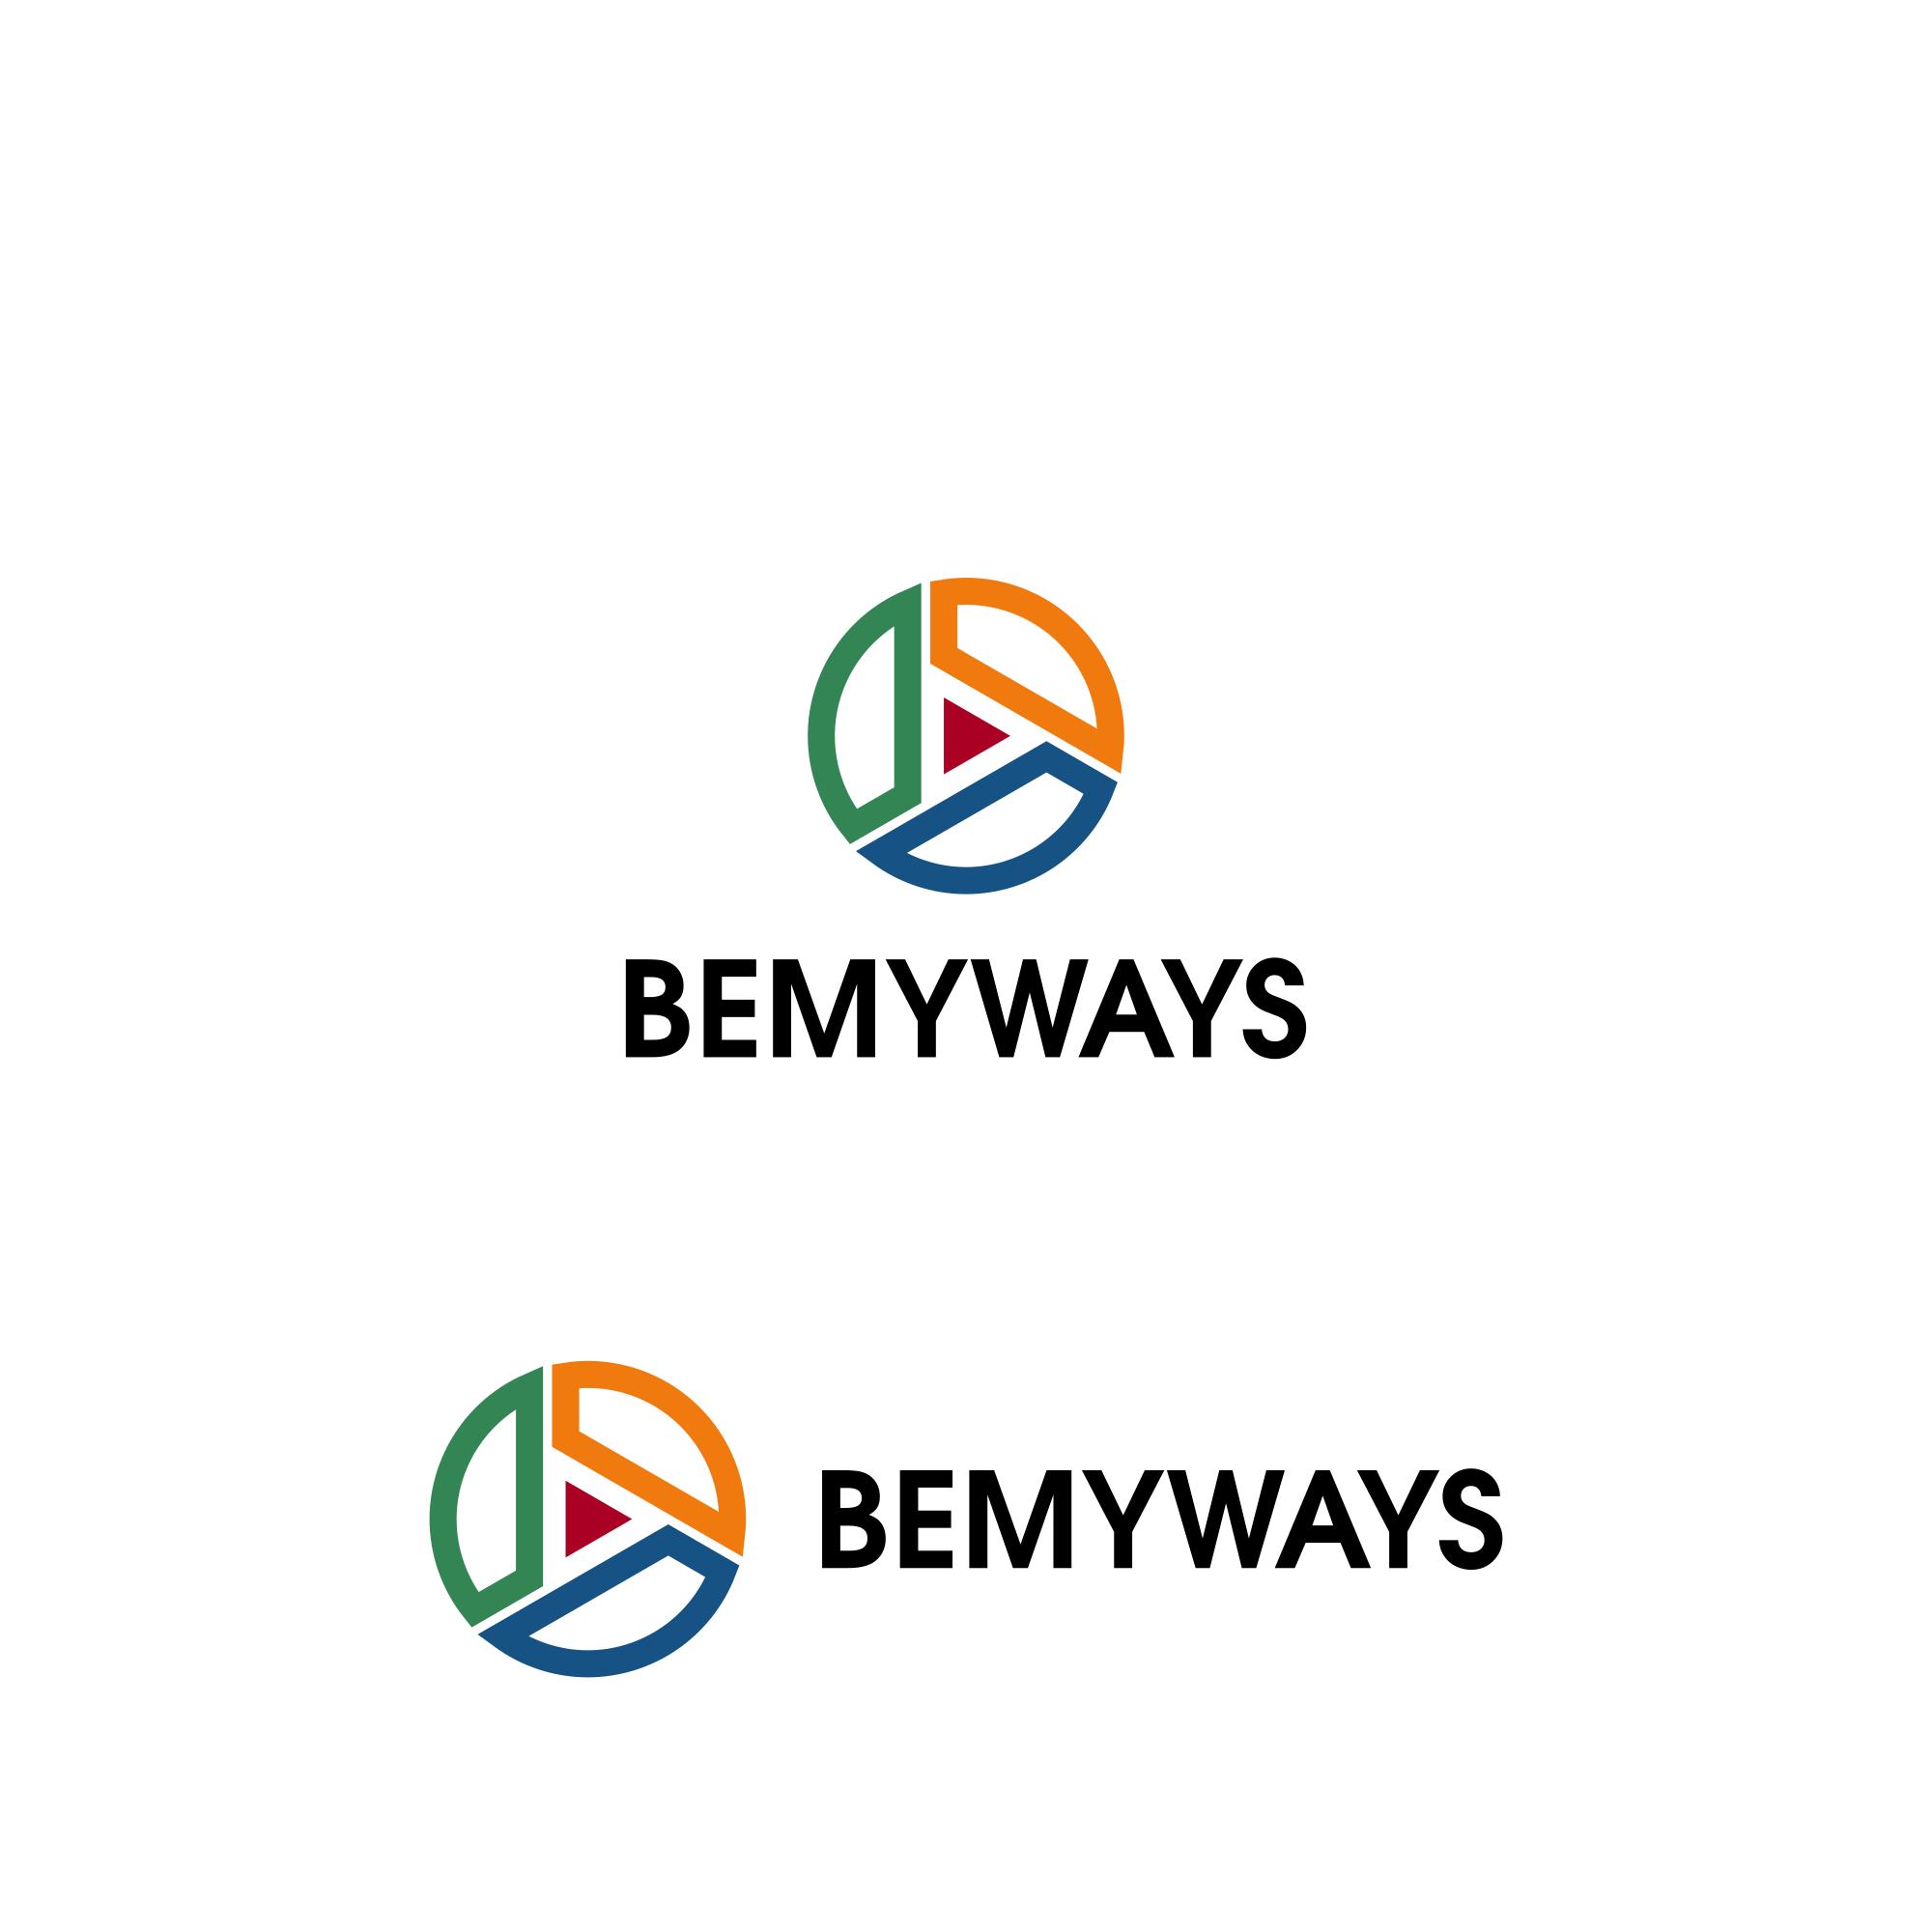 Разработка логотипа и иконки для Travel Video Platform фото f_8715c3c785d3f746.png